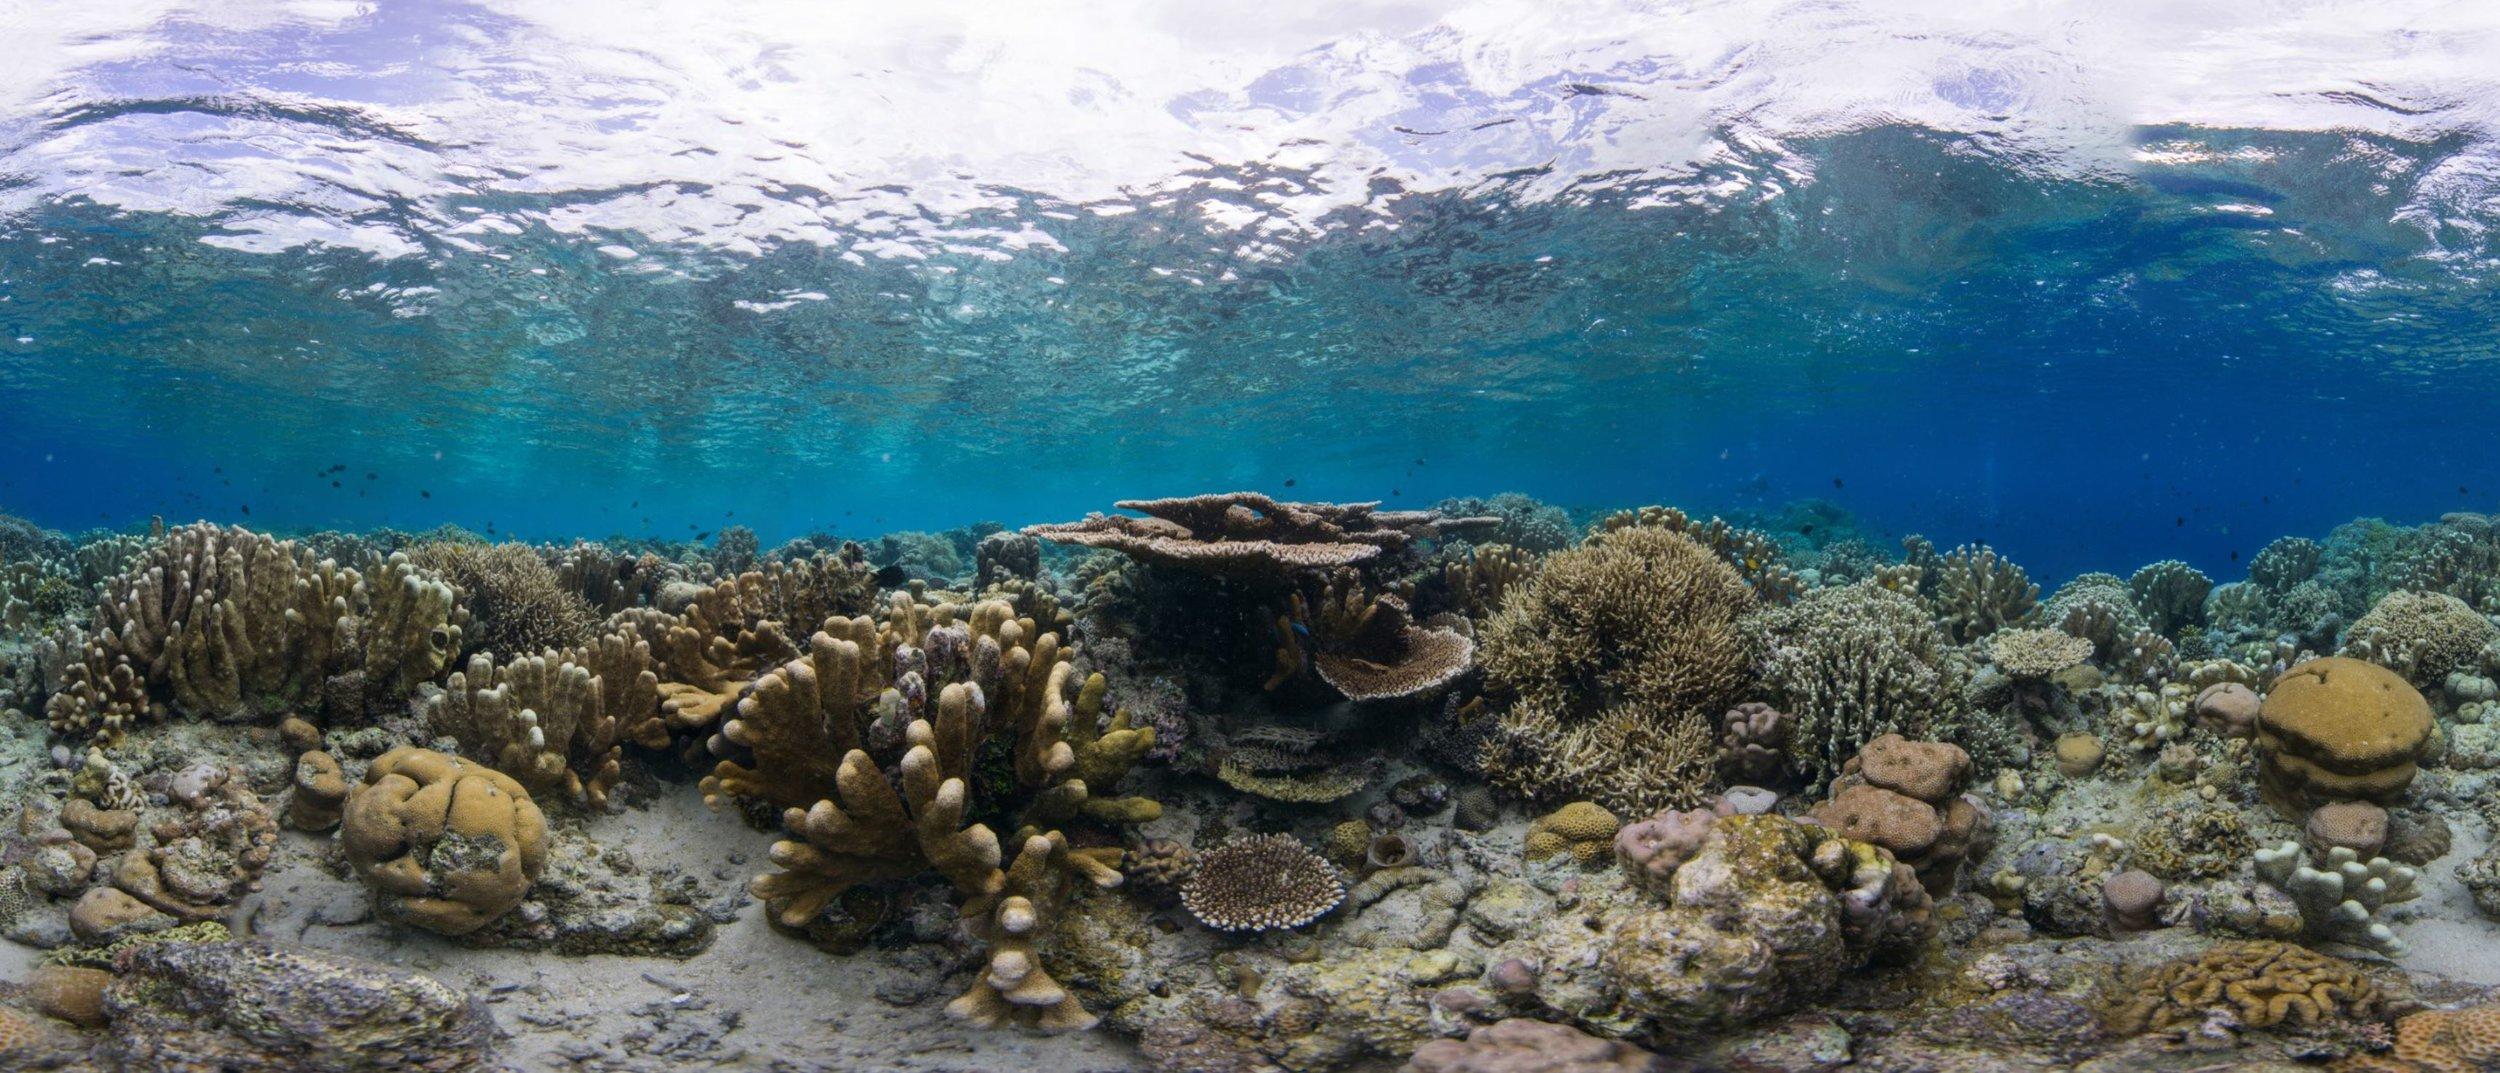 24- a HEALTHY coral reef in manado, indonesia Credit: The ocean agency / paul g. allen philanthropies